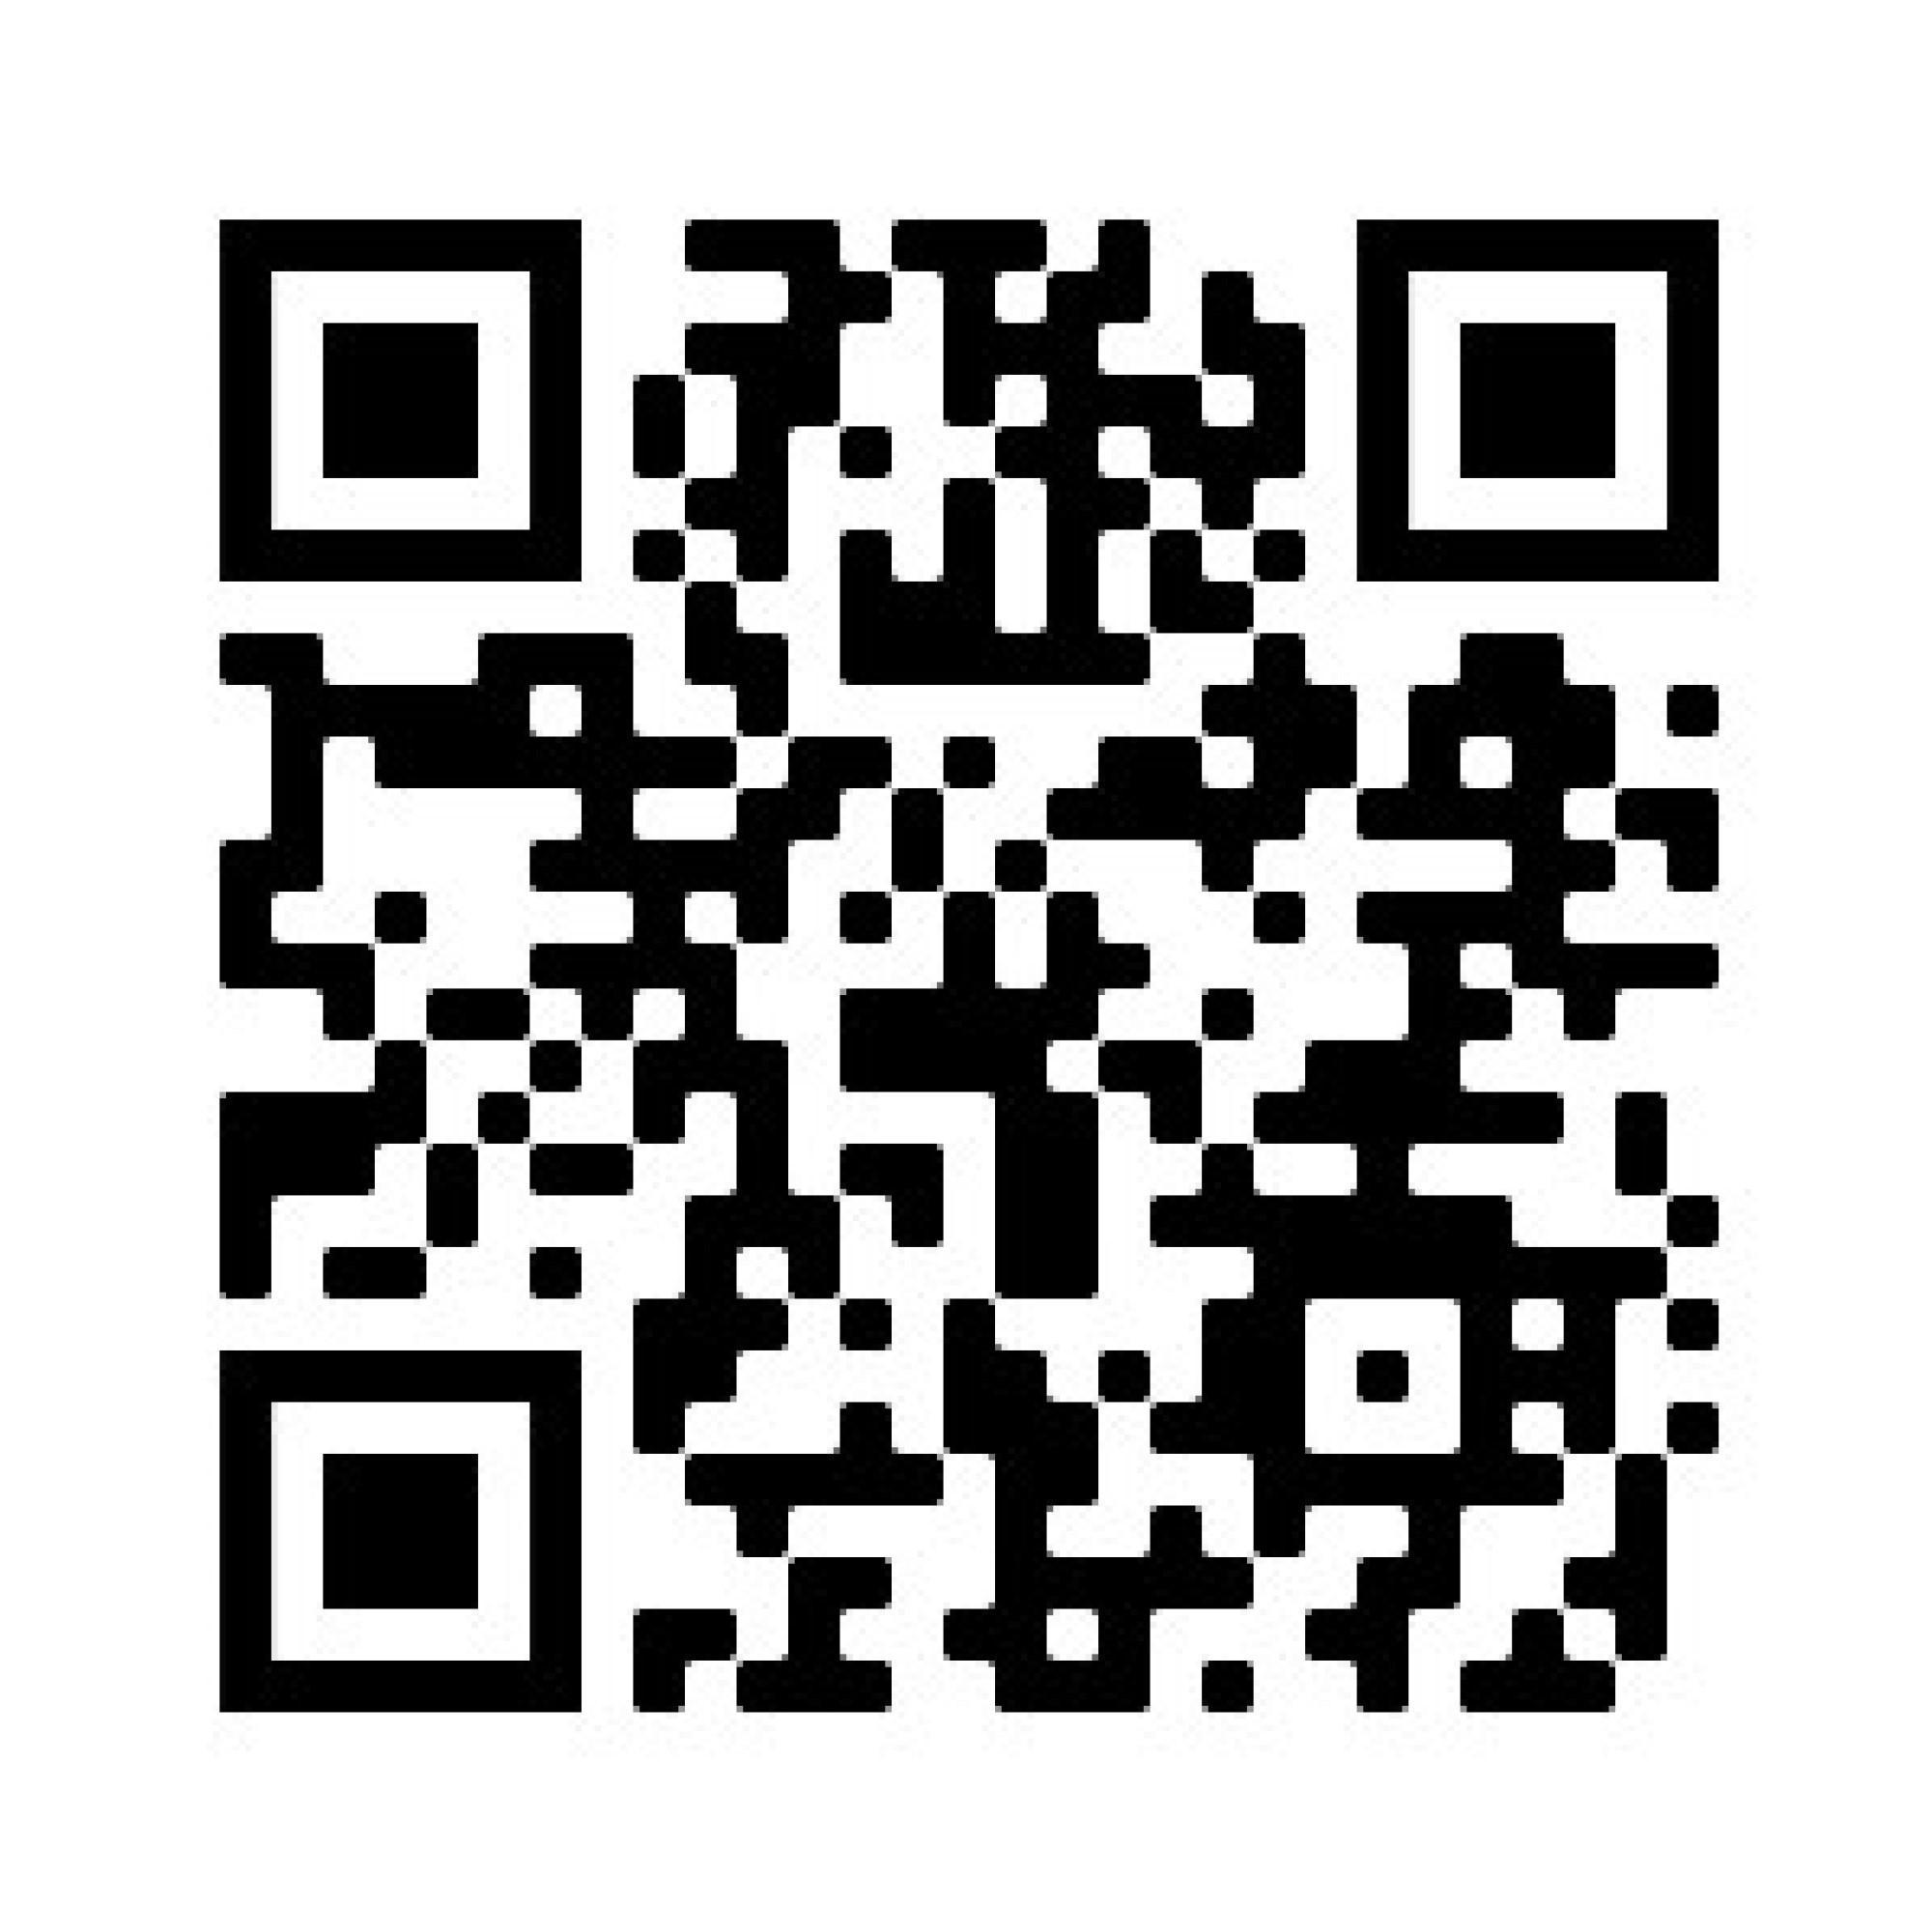 Ksvotes.org